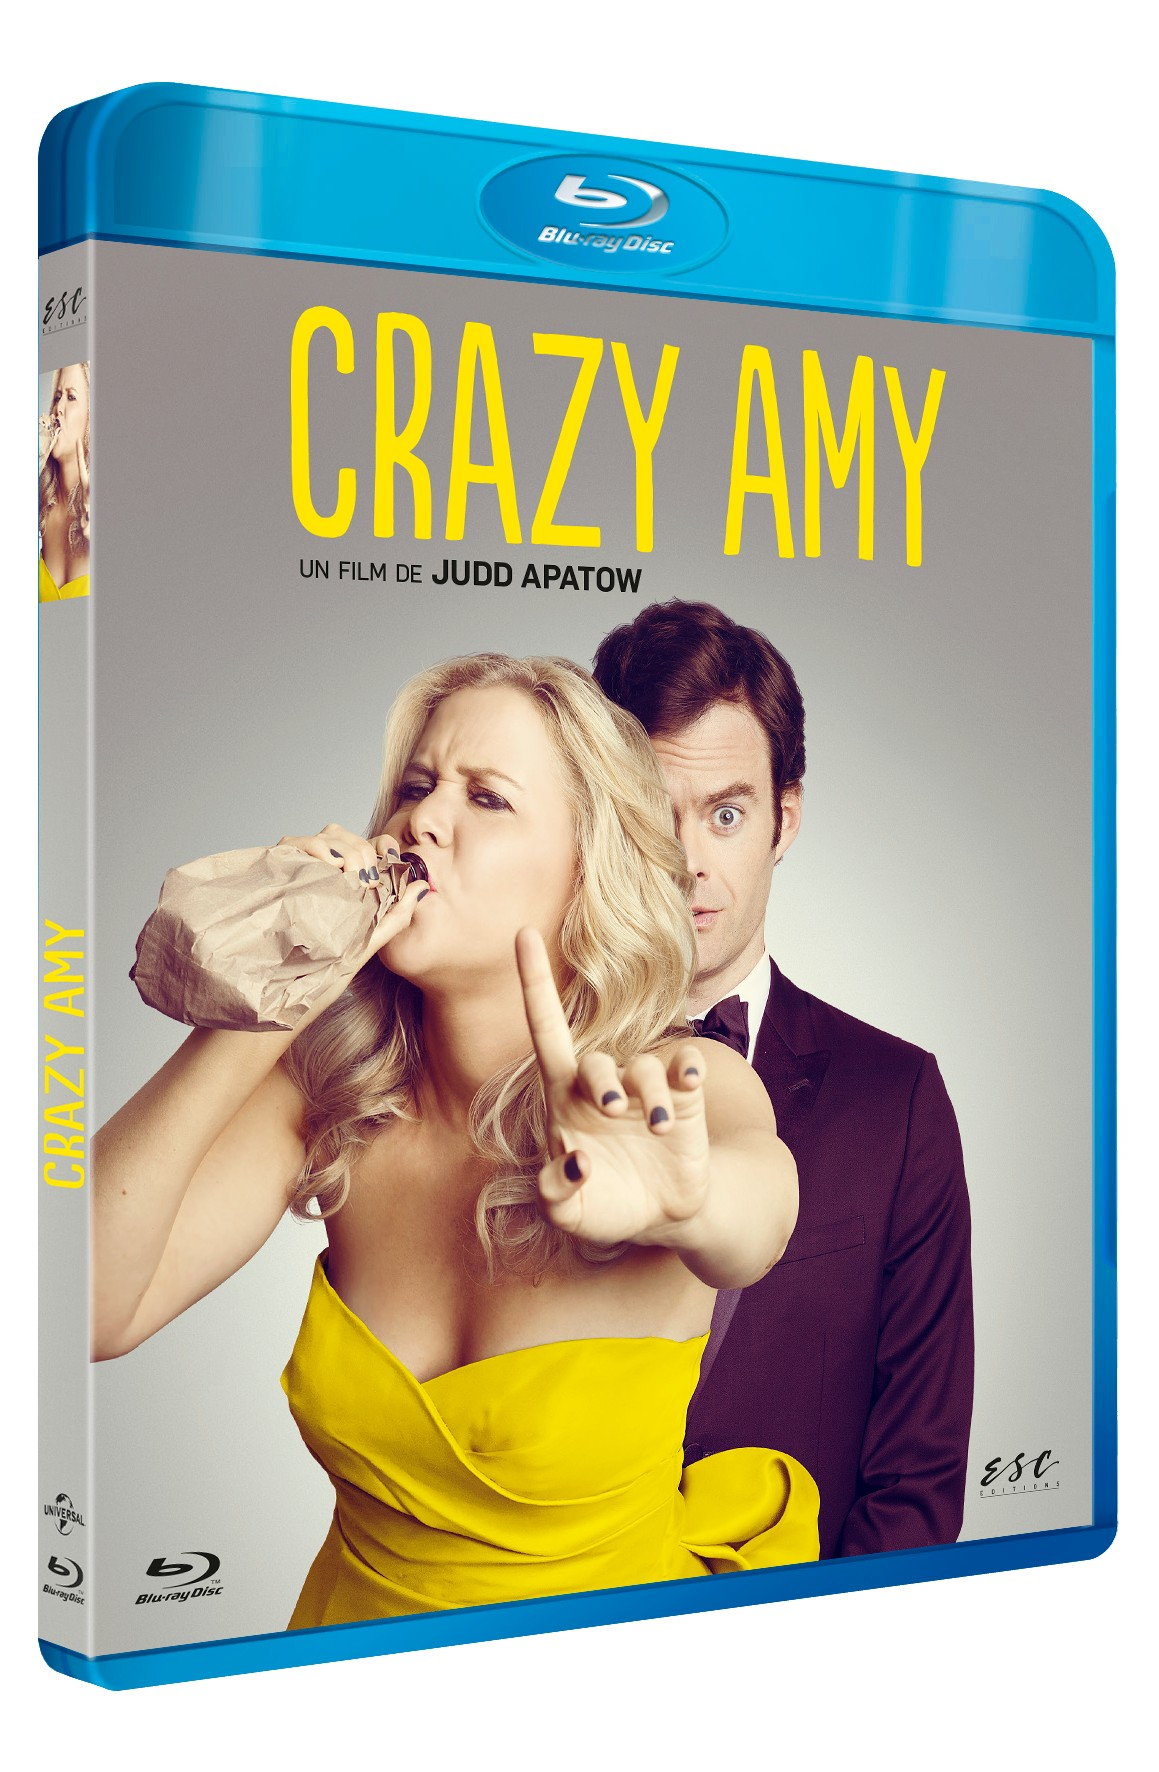 CRAZY AMY (TRAINWRECK) - BRD